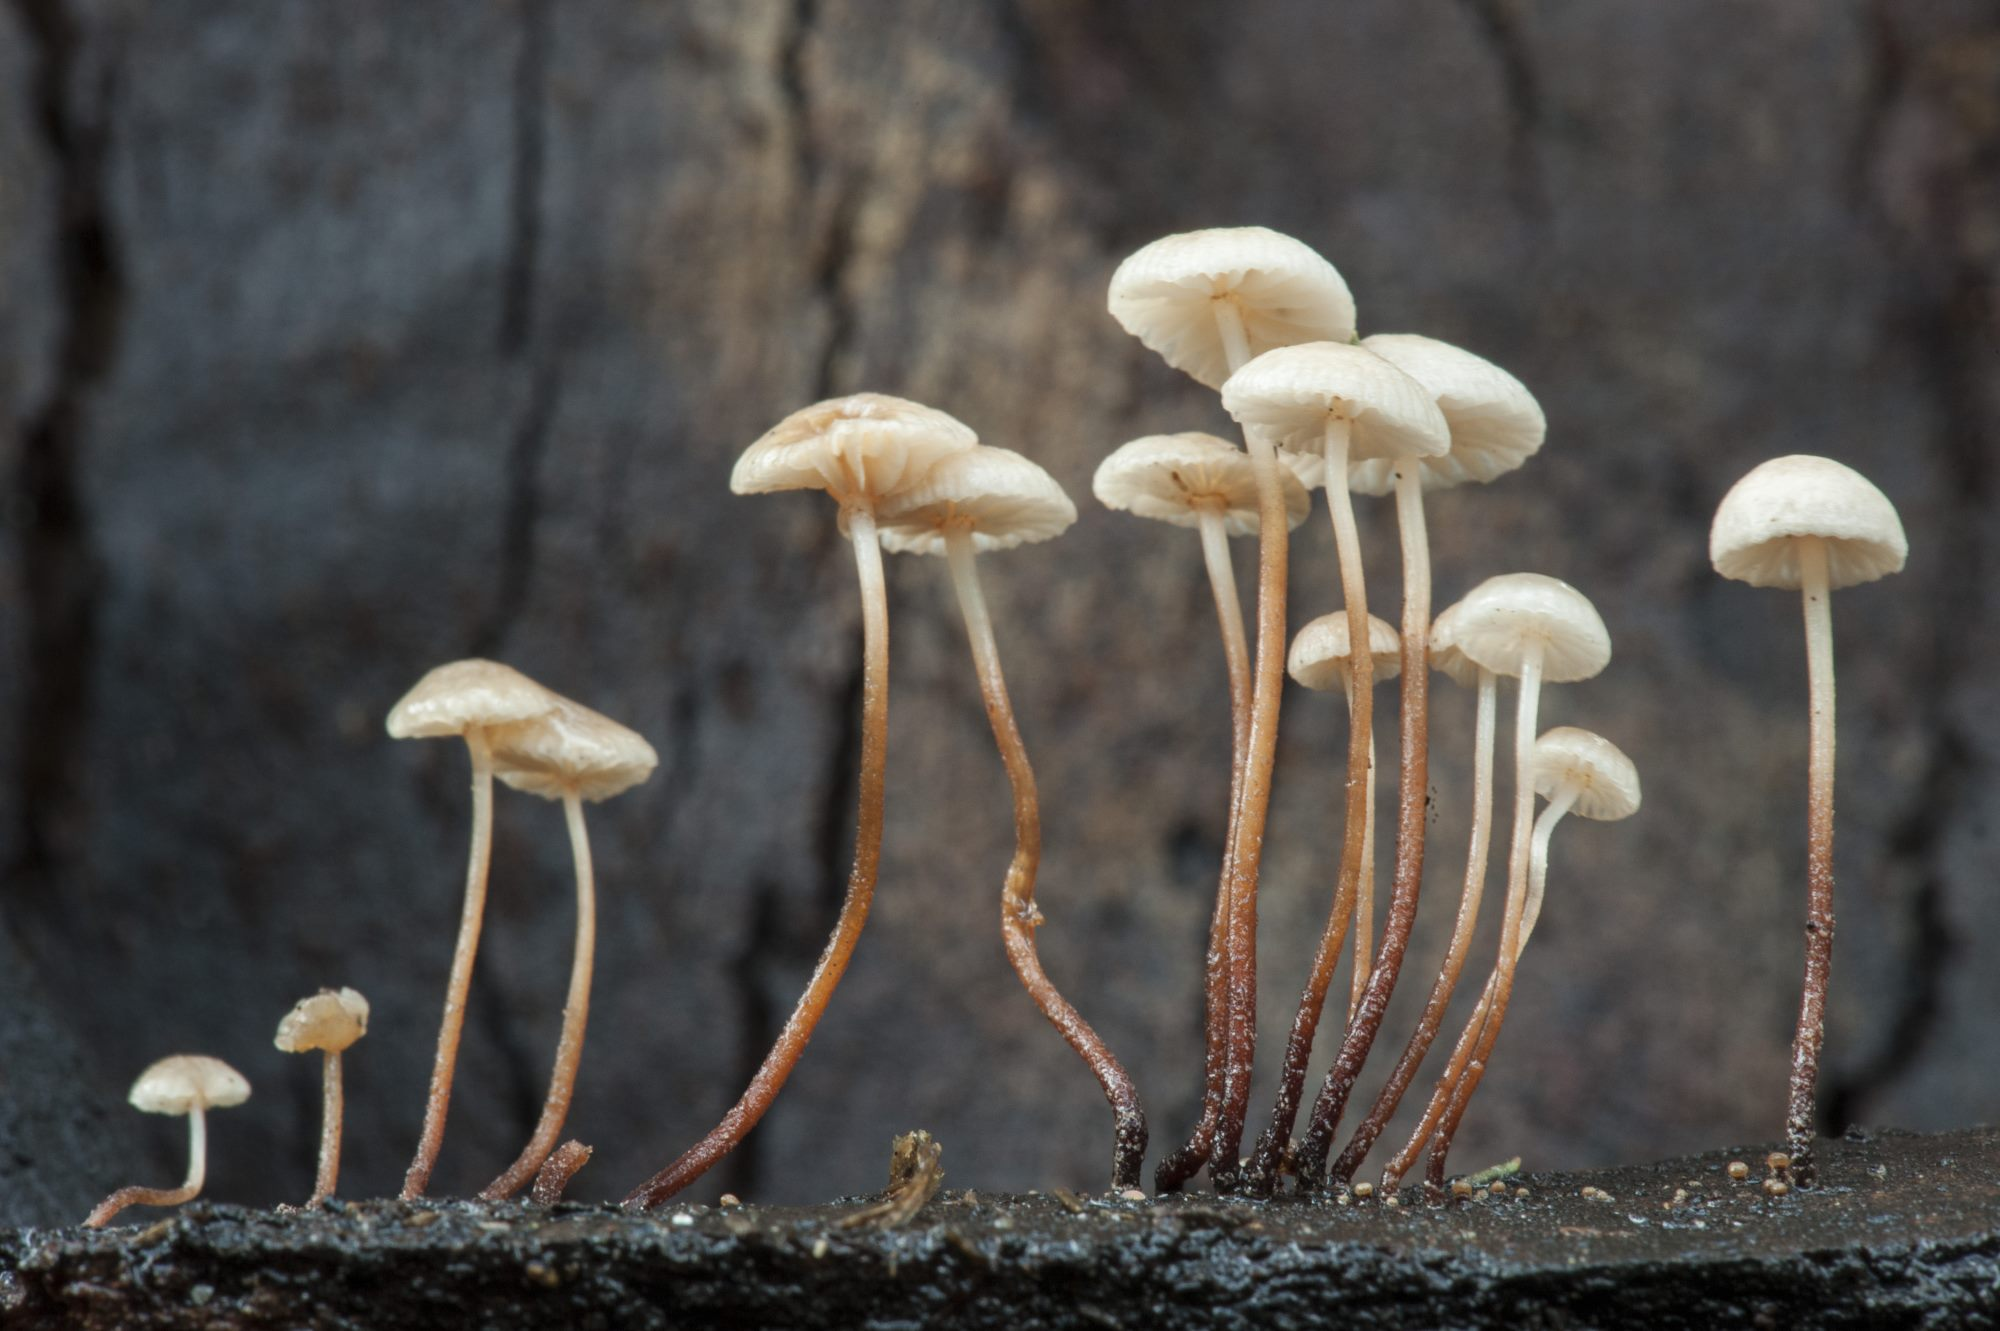 The tiny sporocarps of a Marsmiellus